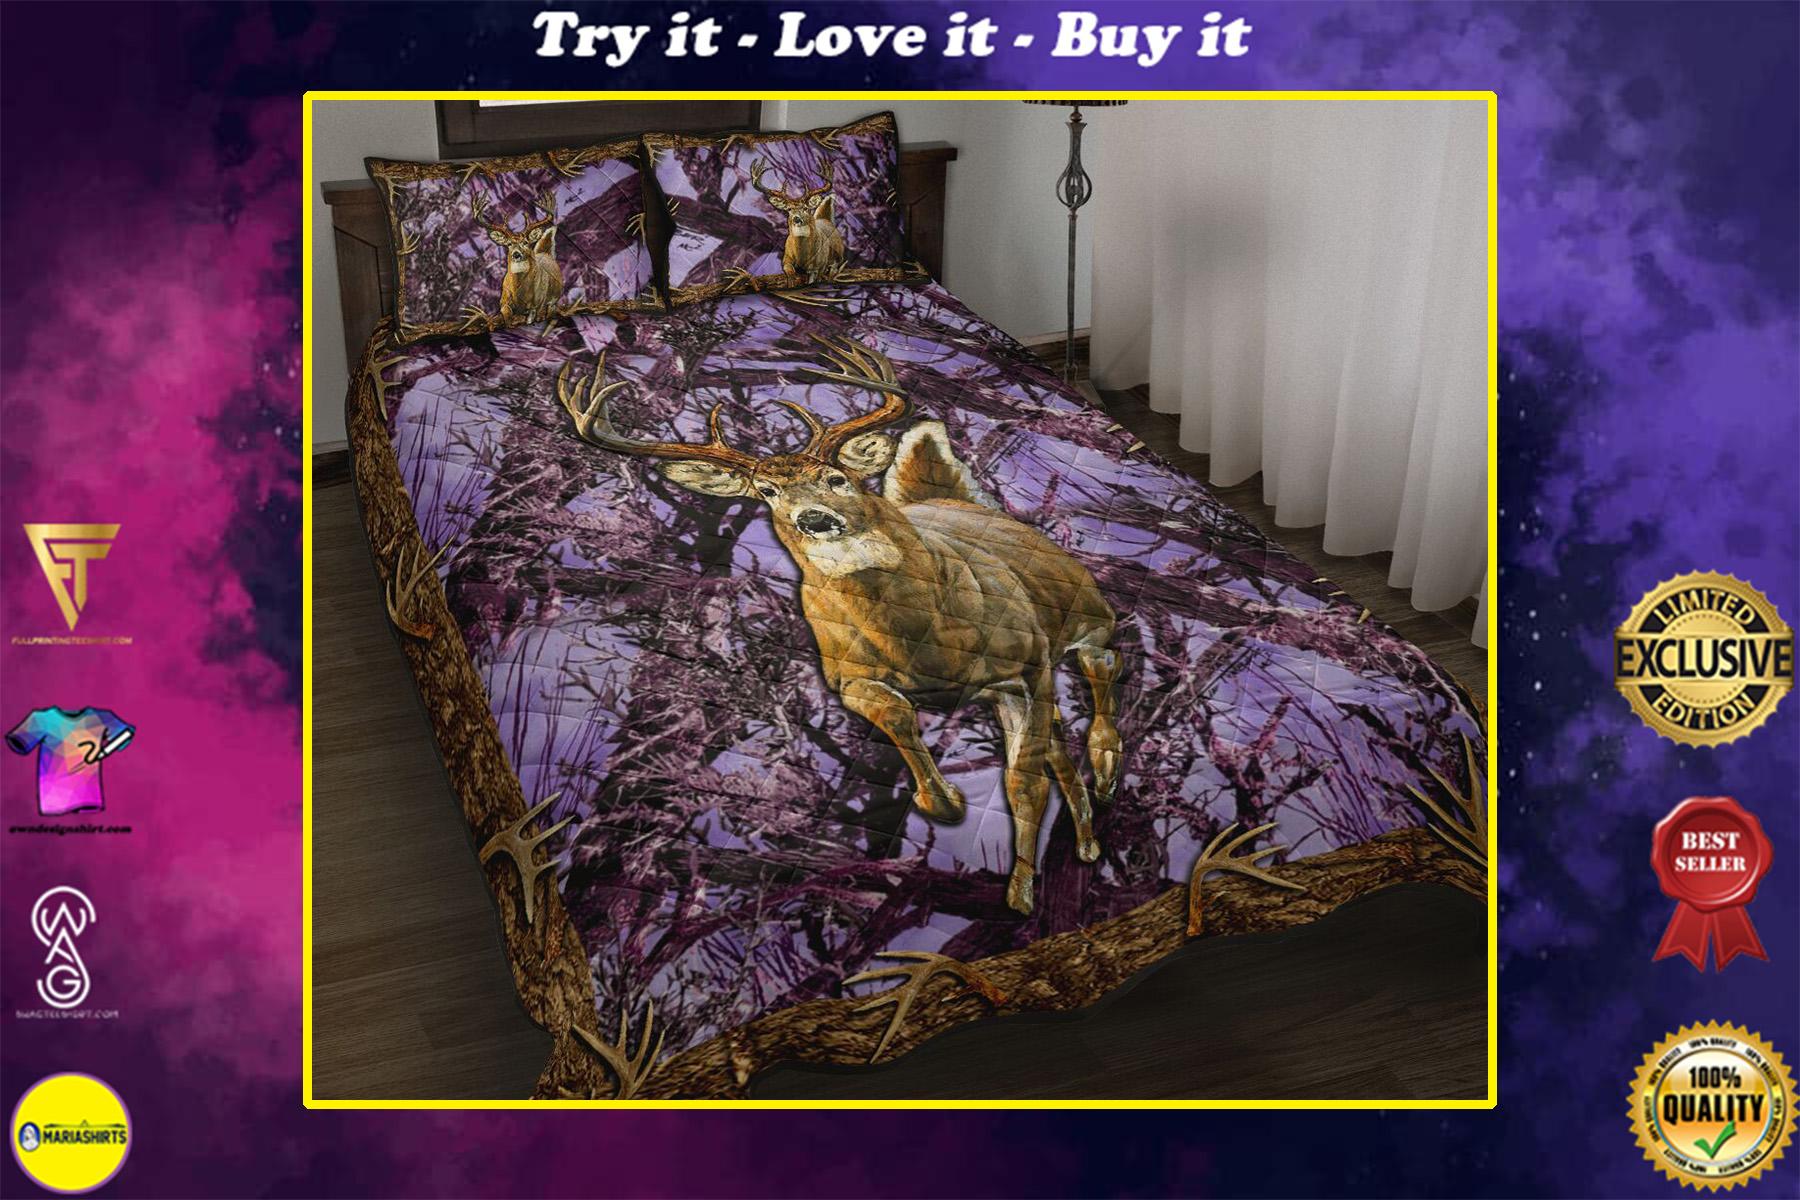 deer hunter love hunting purple full printing bedding set